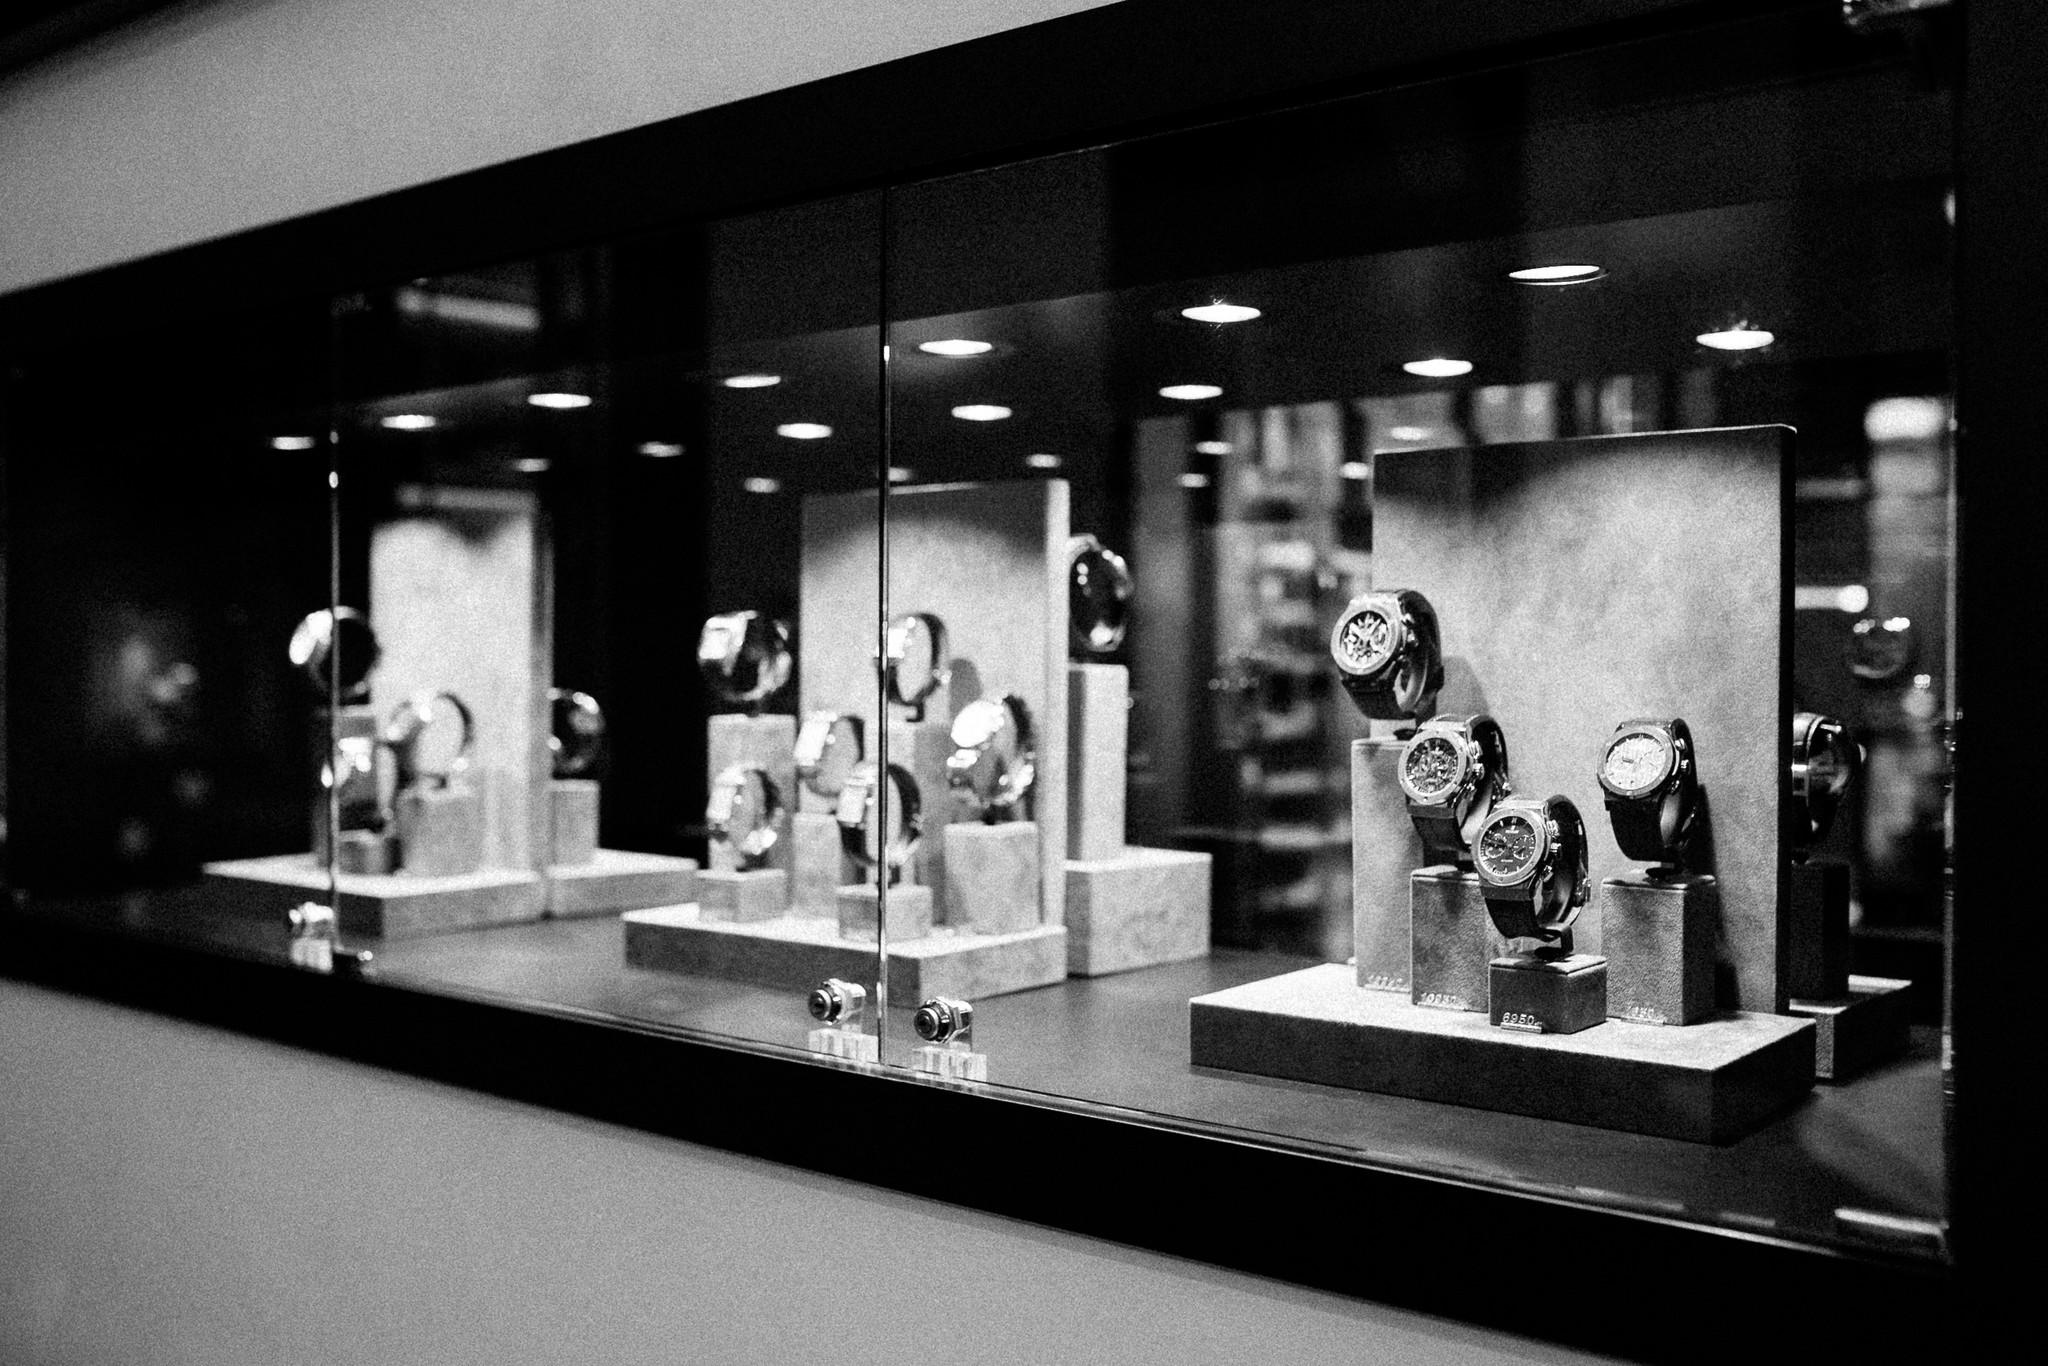 Schaap en Citroen Vintage watches Amsterdam | binnenkant juweliershuis